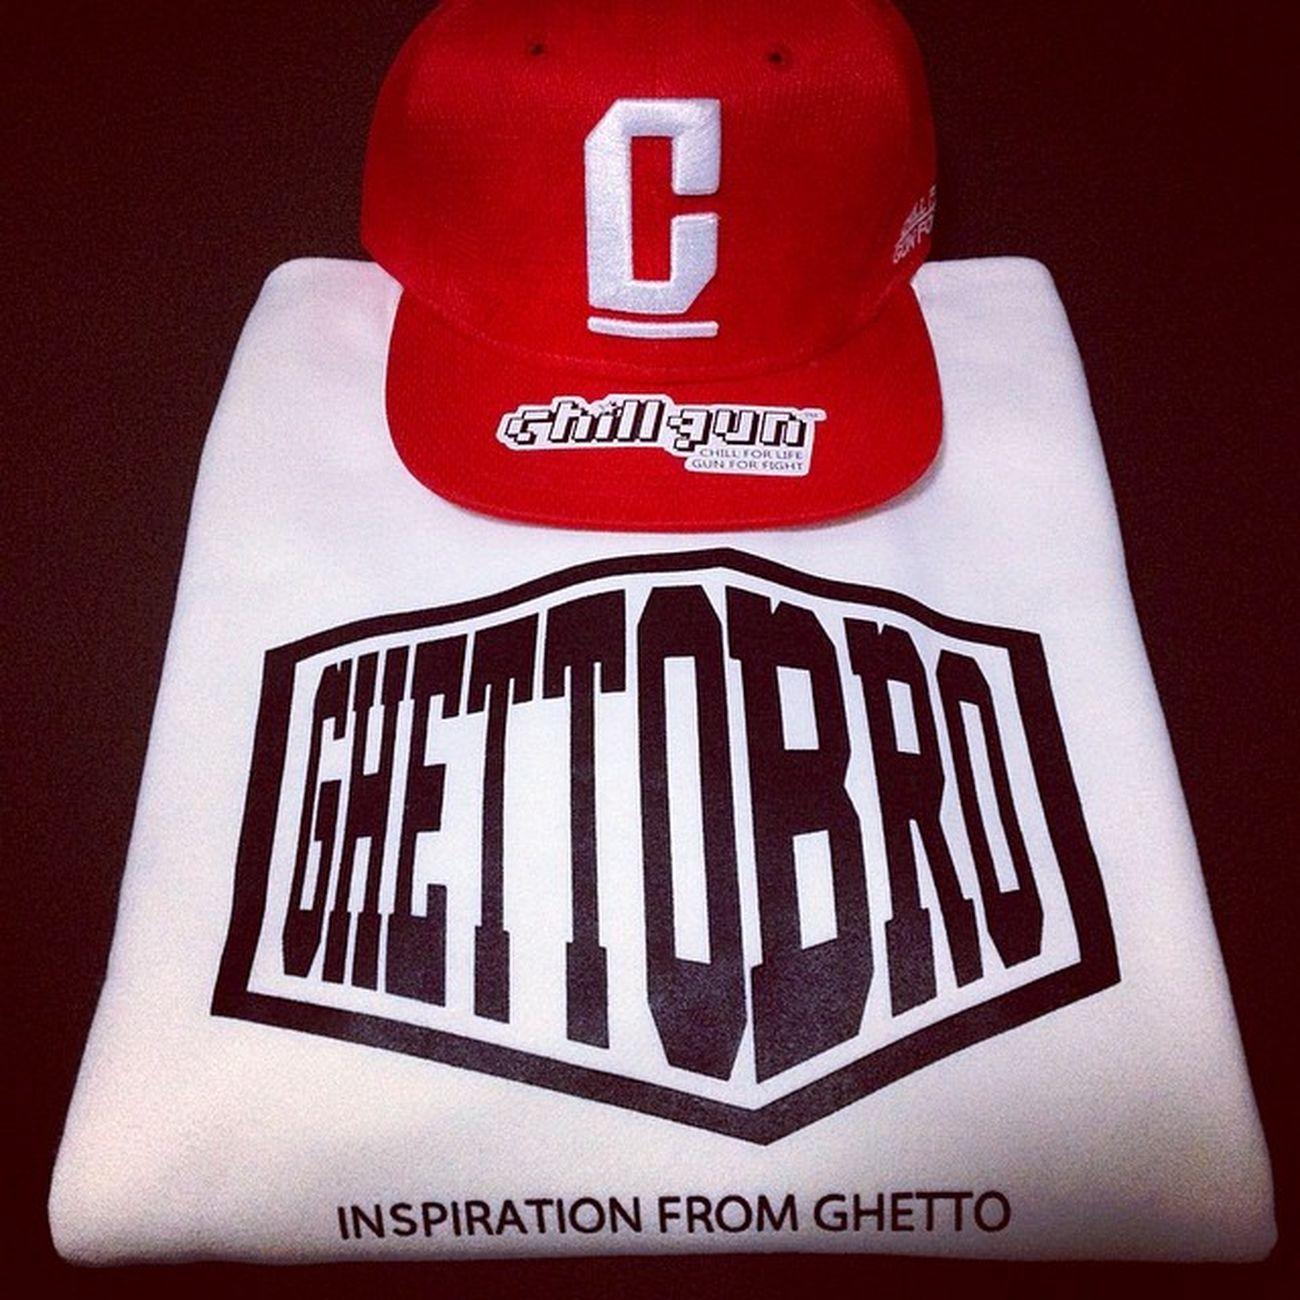 Ghettobro &Chillgun 最佳搭配 ?✨?✨?✨?✨?✨?都是最愛